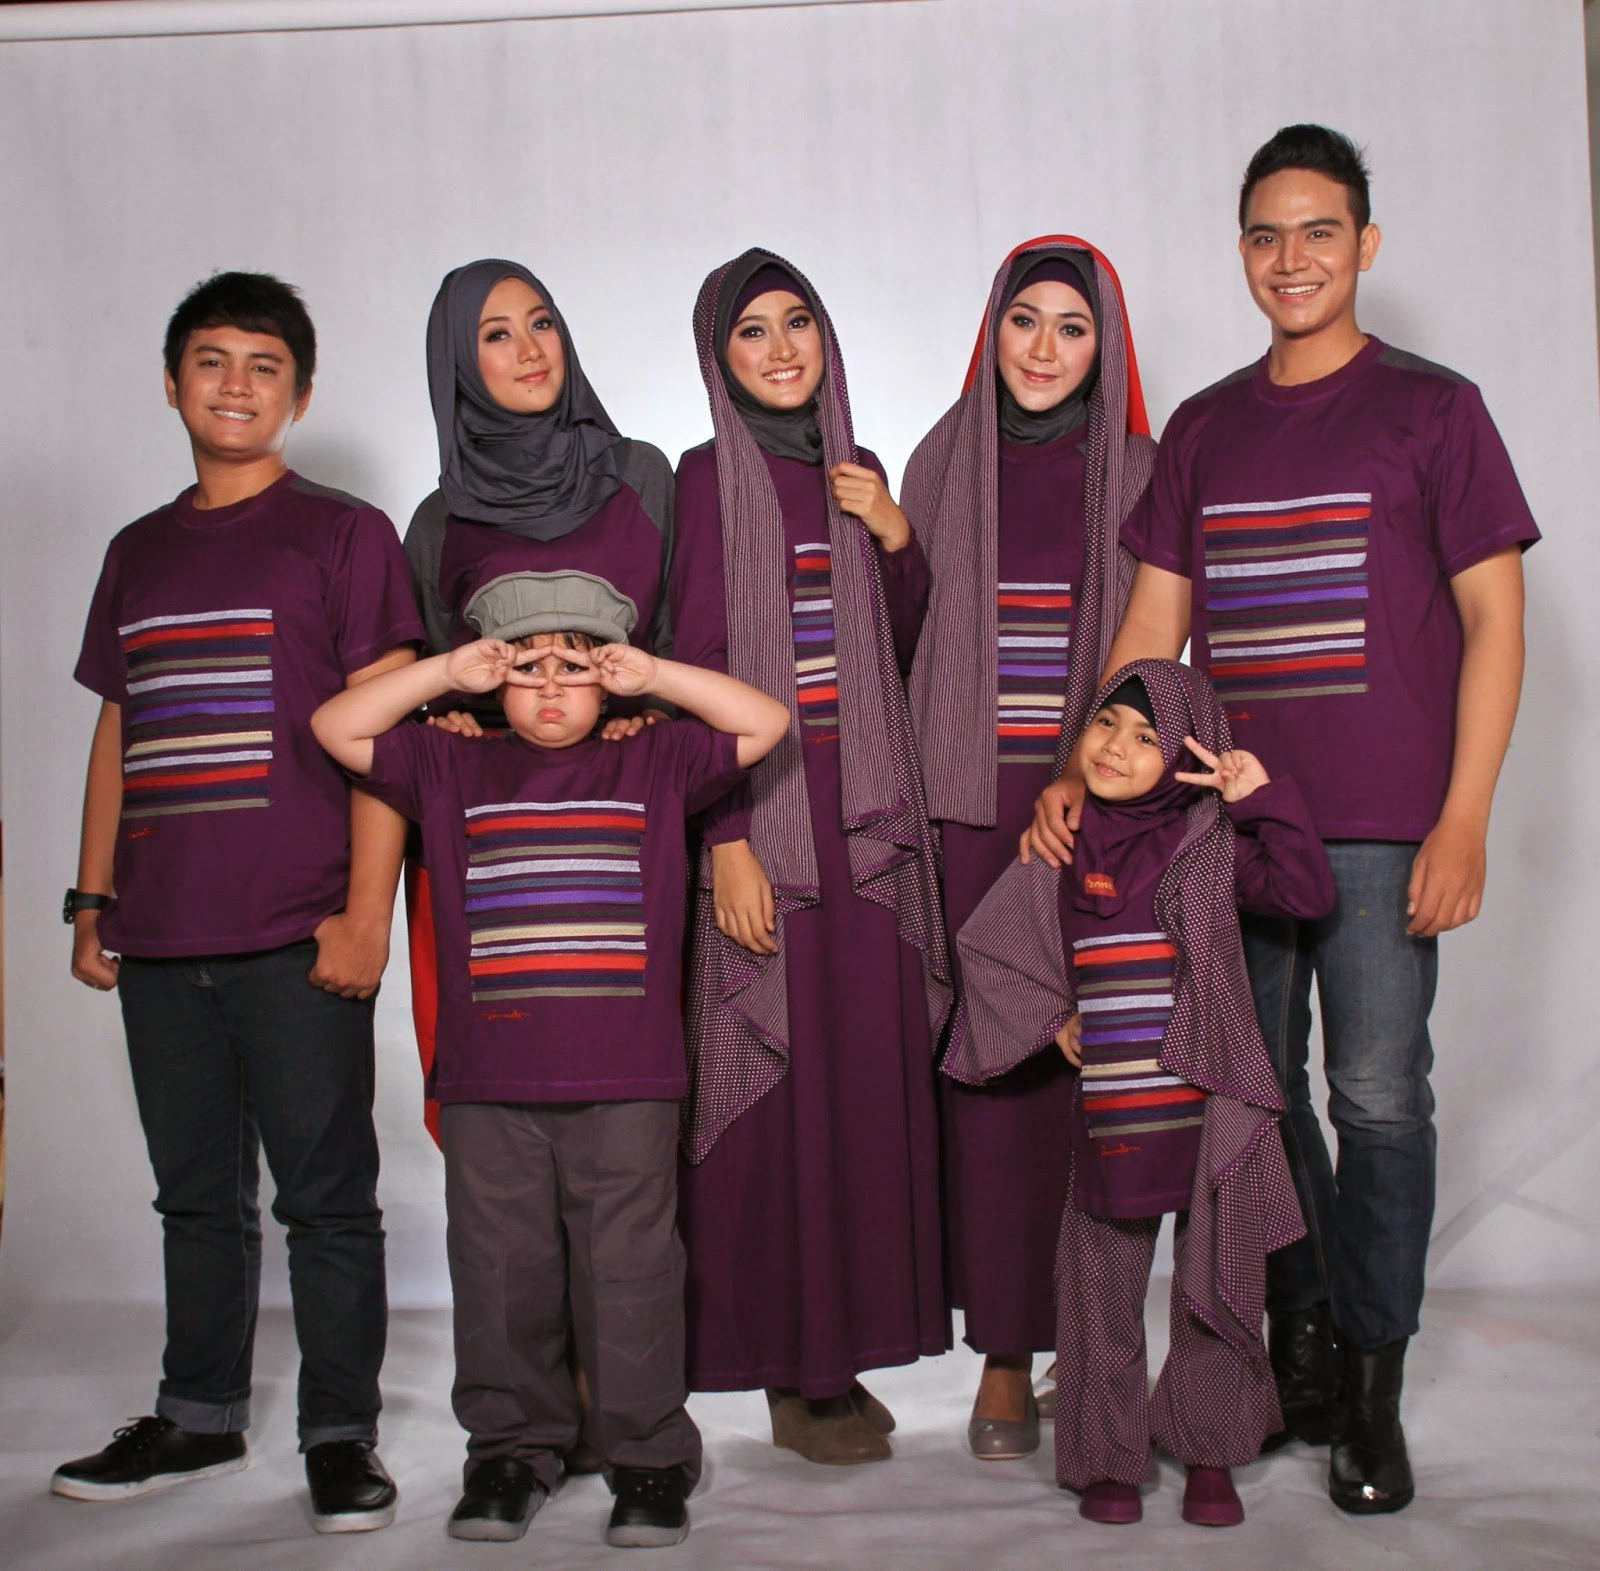 Design Gambar Baju Lebaran Etdg Model Baju Keluarga Untuk Hari Raya Lebaran 2018